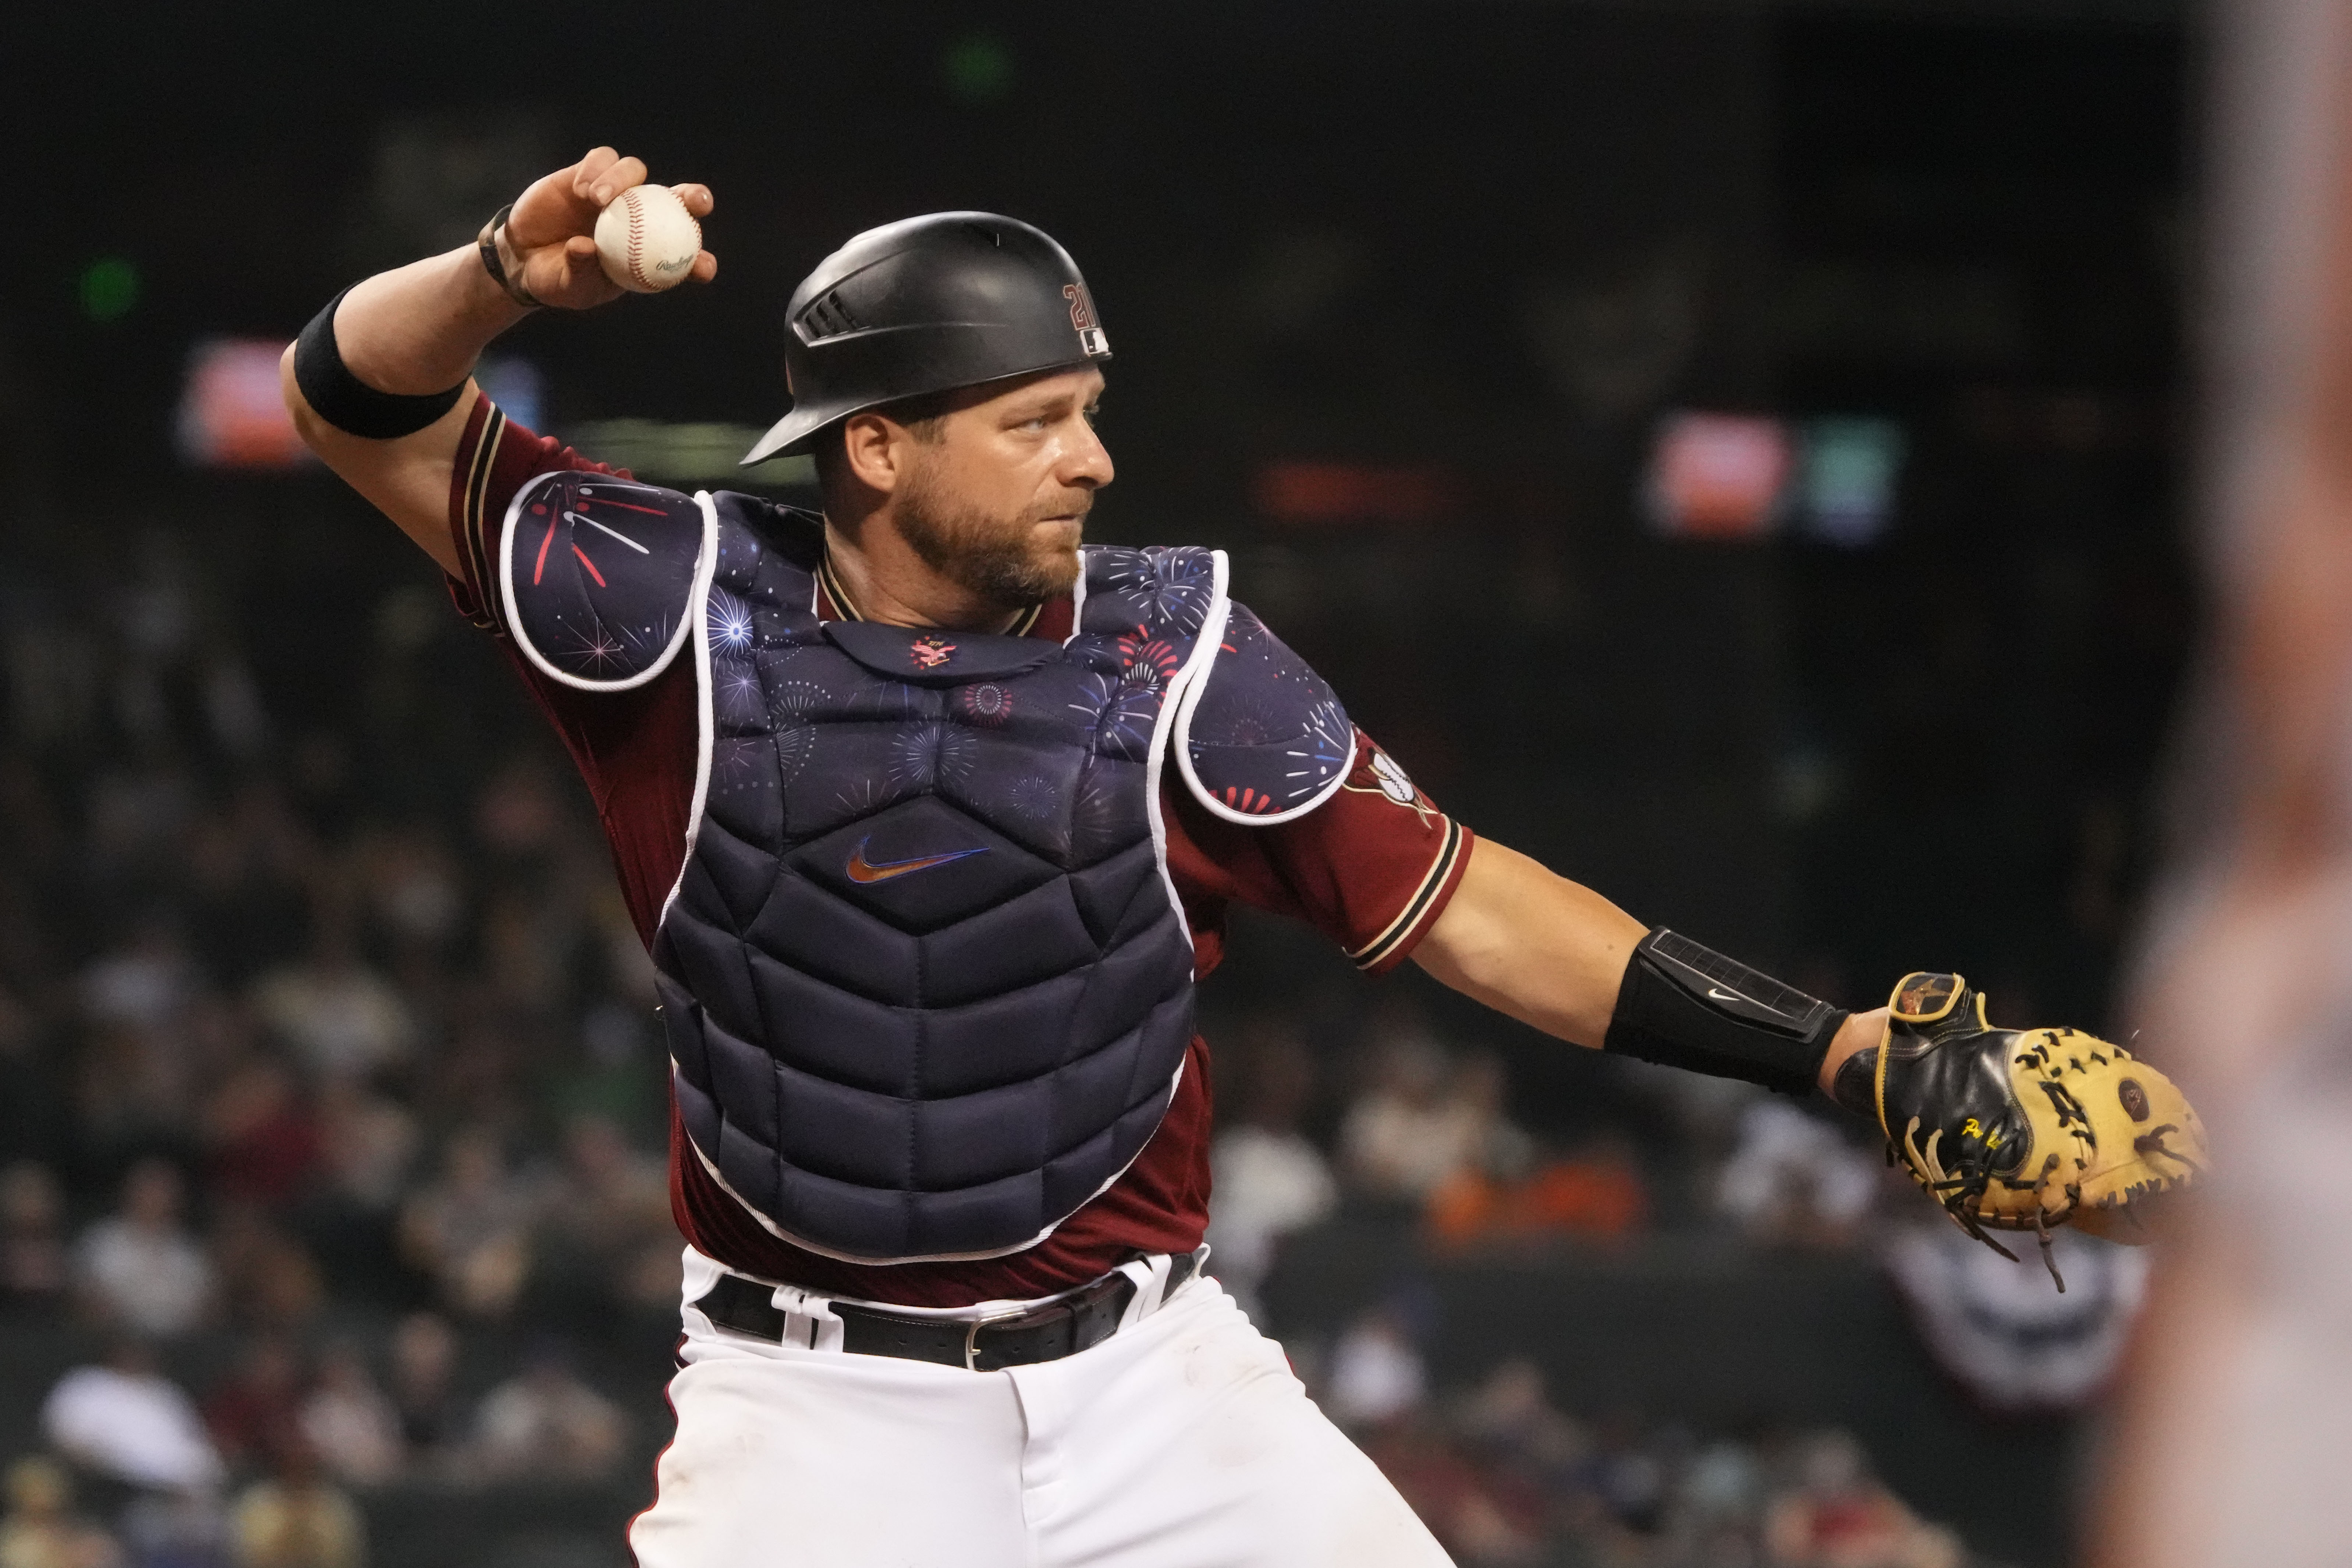 Diamondbacks trade catcher Stephen Vogt to the Braves